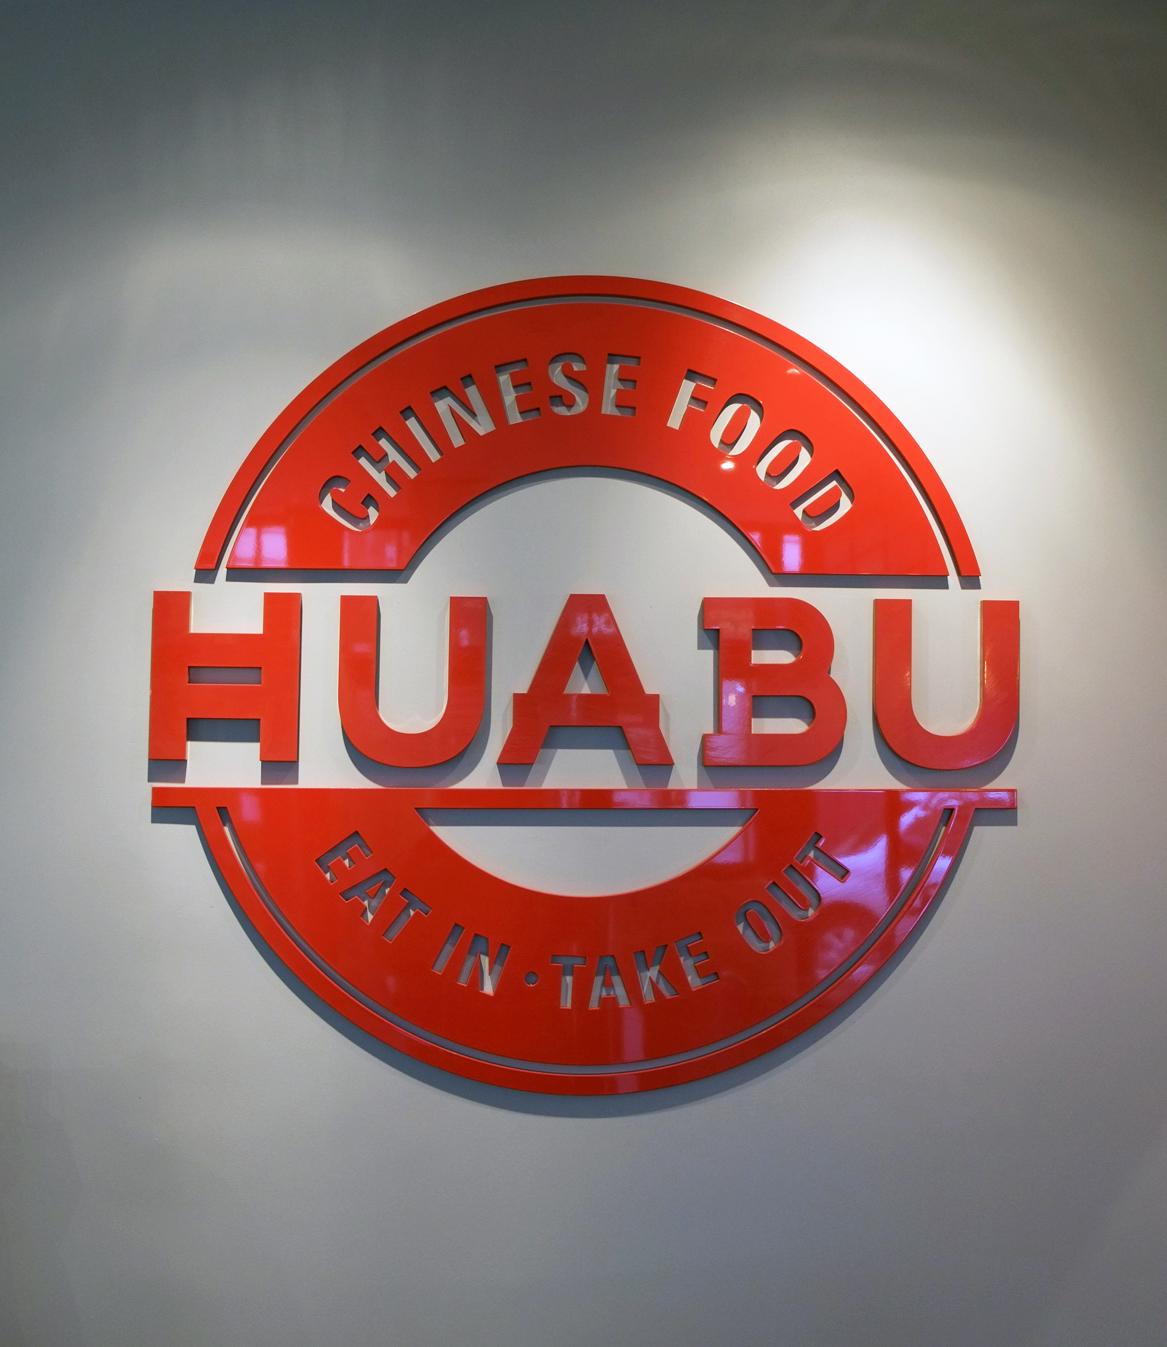 DECOUPE GRAVURE LASER HUABU CHINESE FAST FOOD KRISTIN FREDERICS AGENCE MA.JO.TIK LOGO PMMA ROUGE